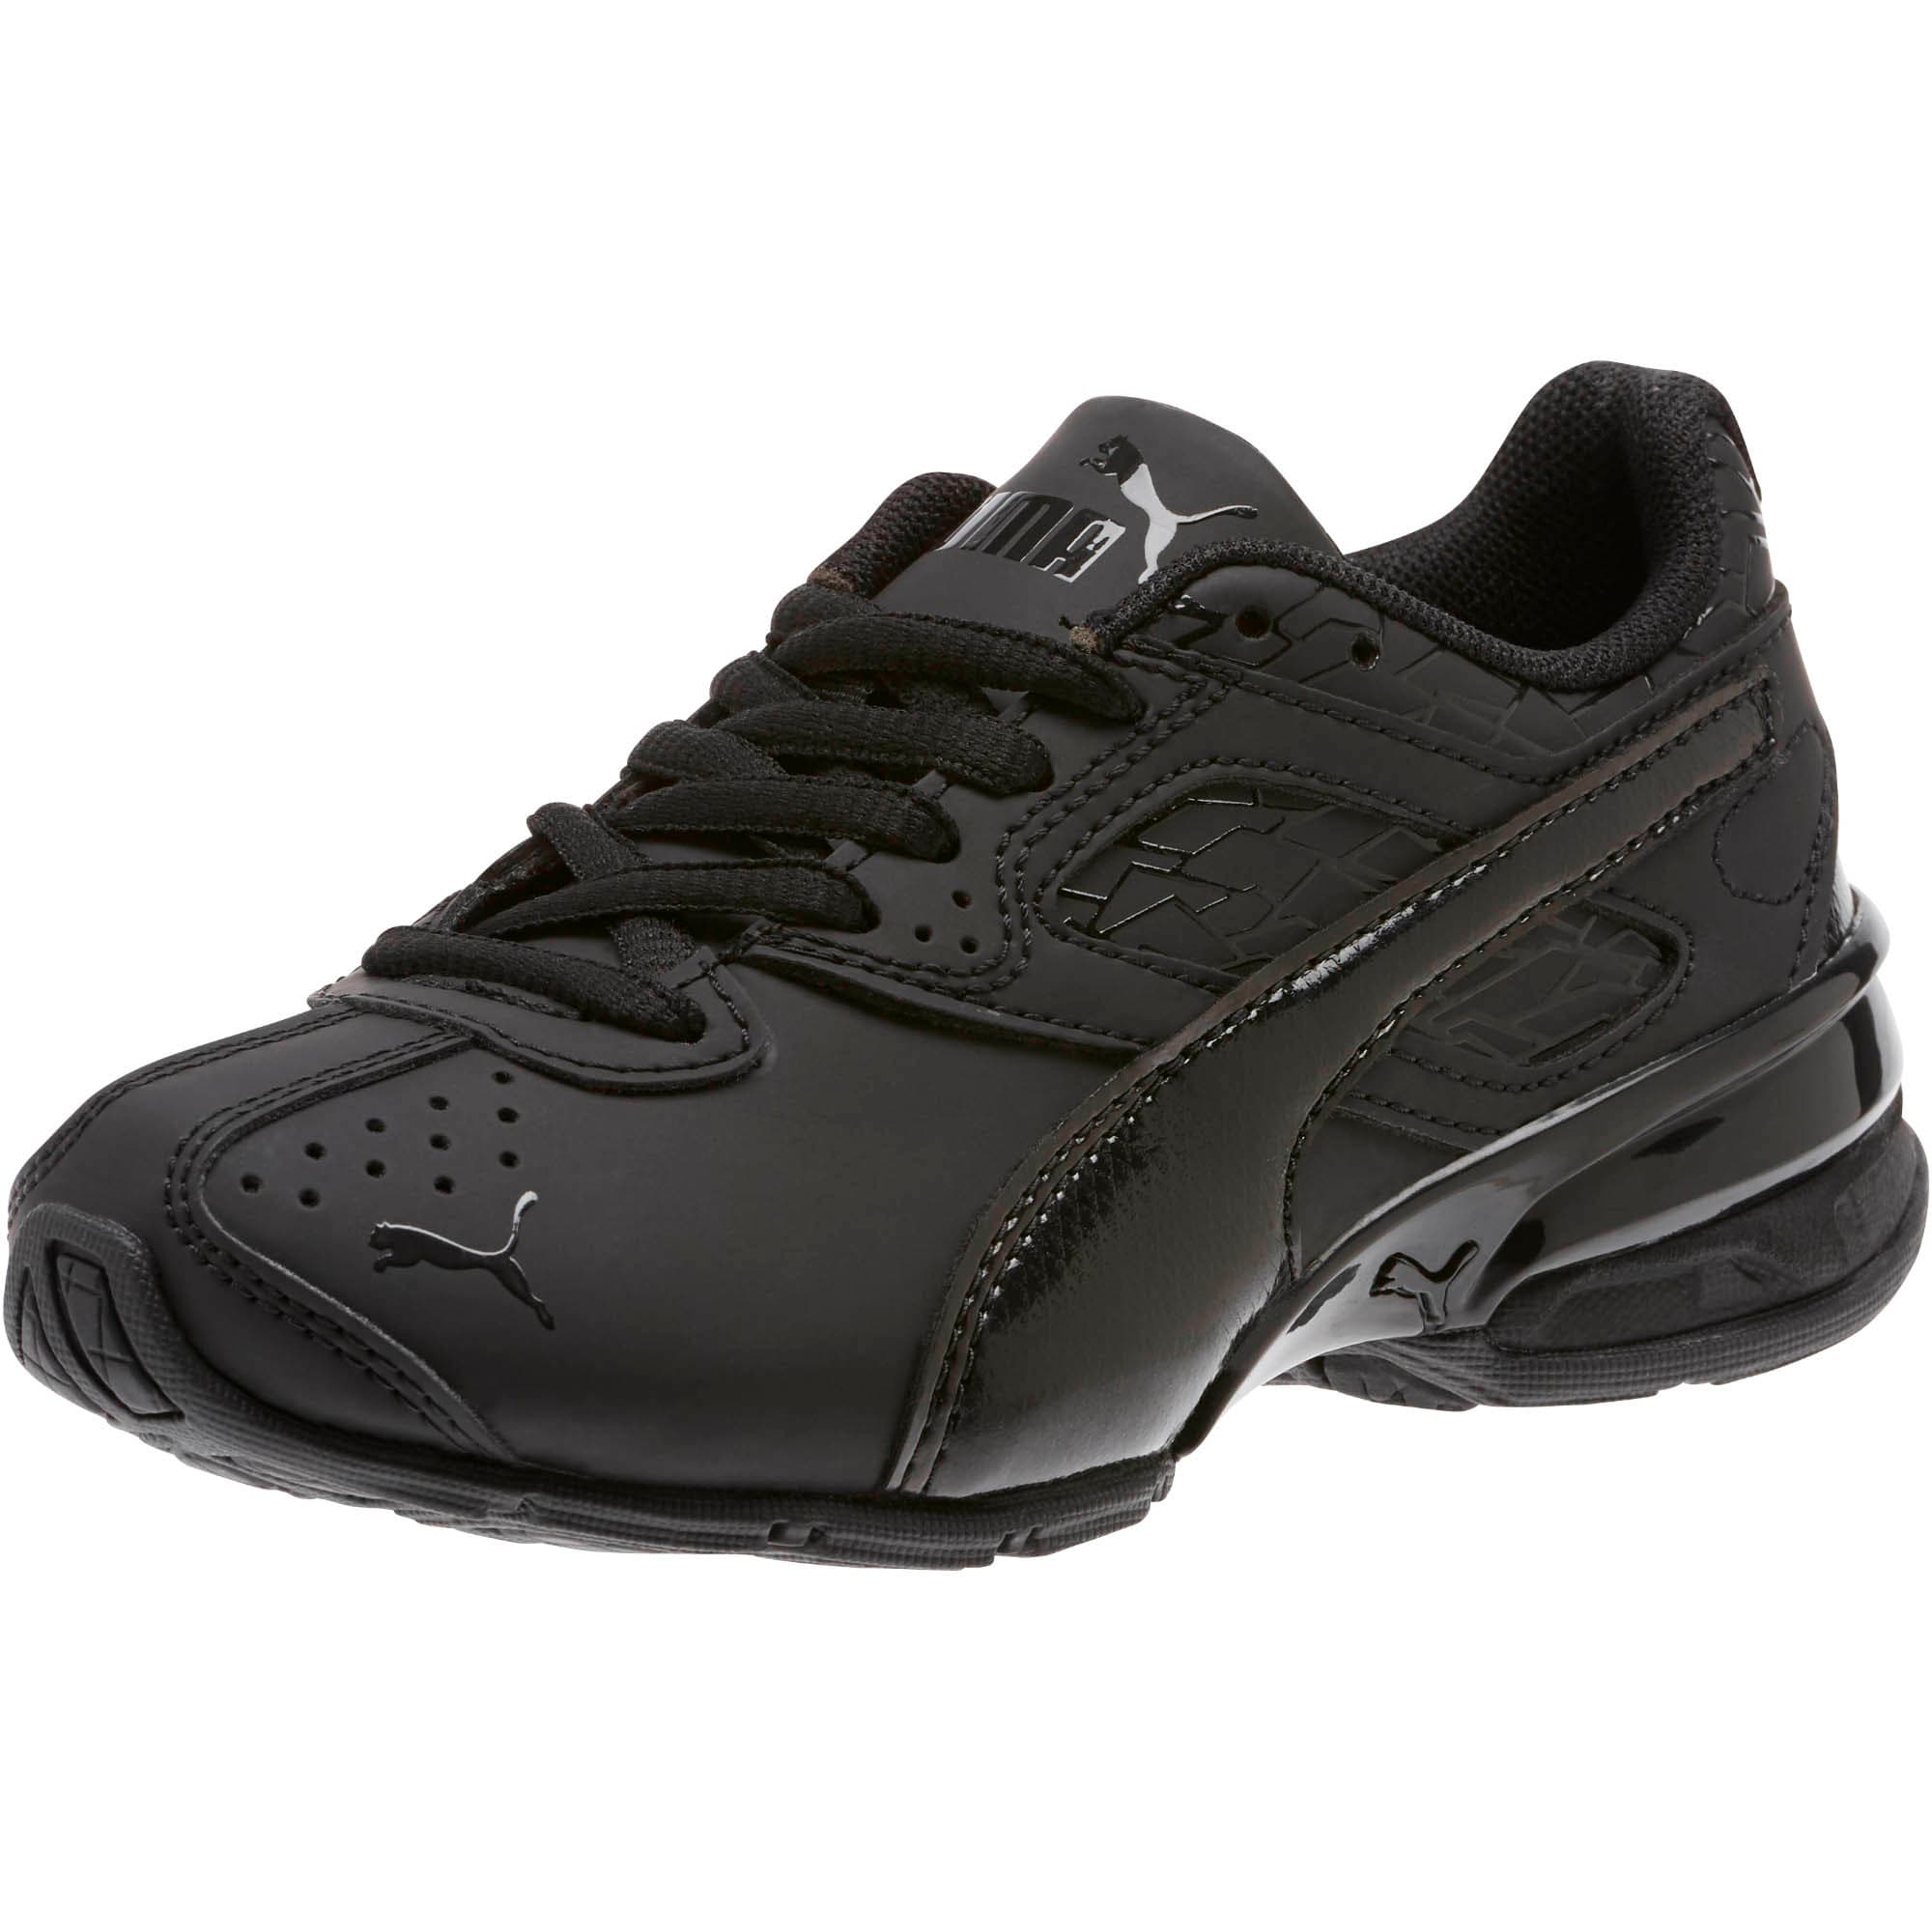 Thumbnail 1 of Tazon 6 Fracture AC Little Kids' Shoes, Puma Black, medium